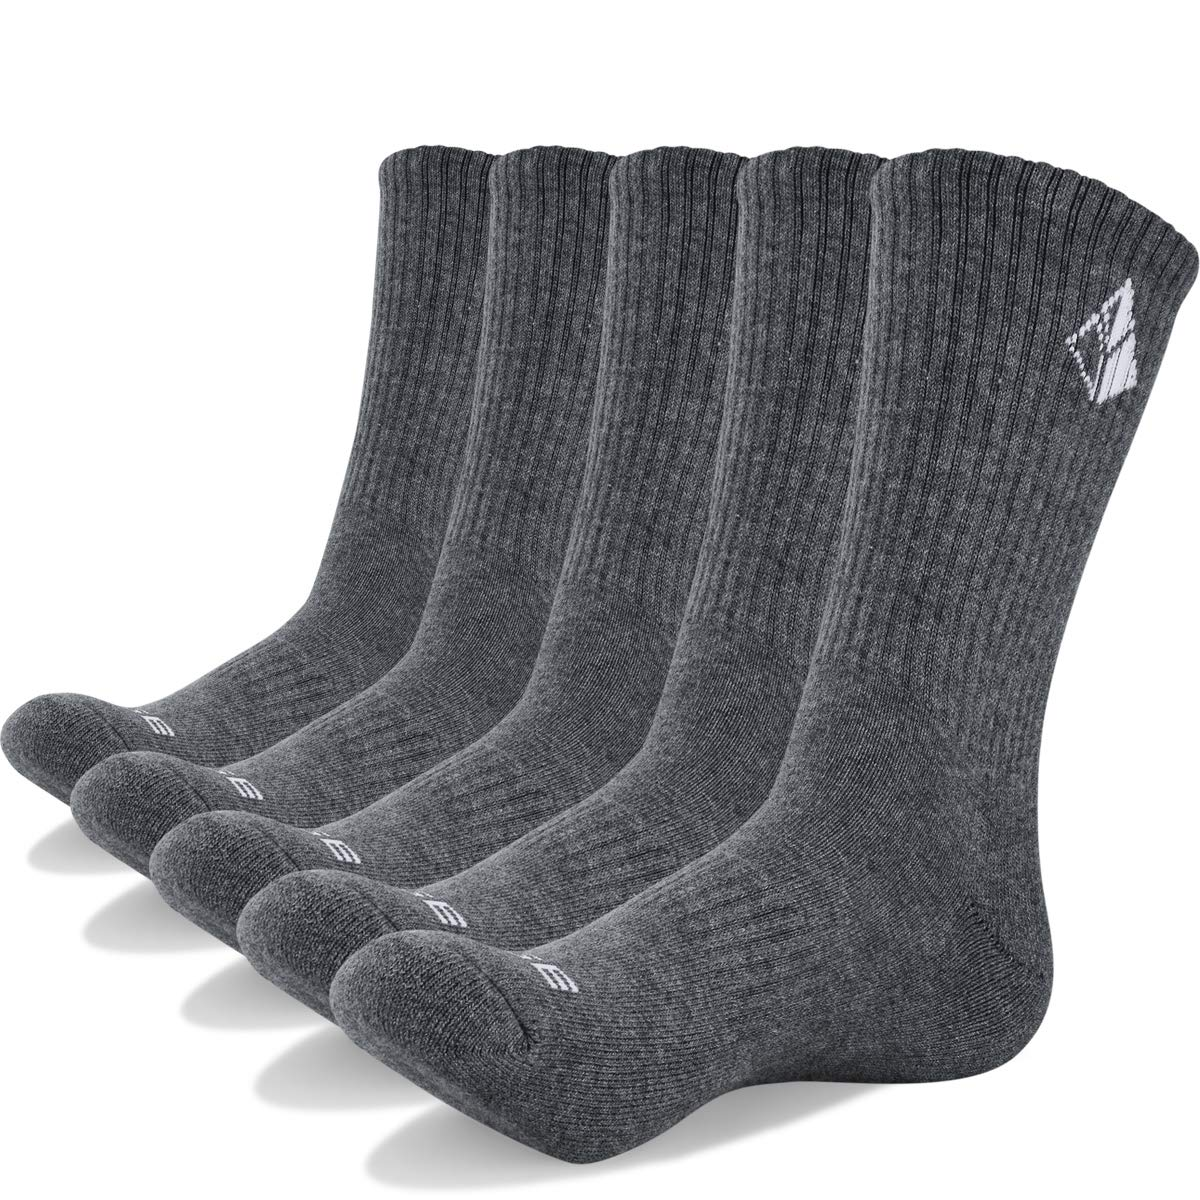 Mens Cotton Crew Outdoors Trekking Hiking Socks